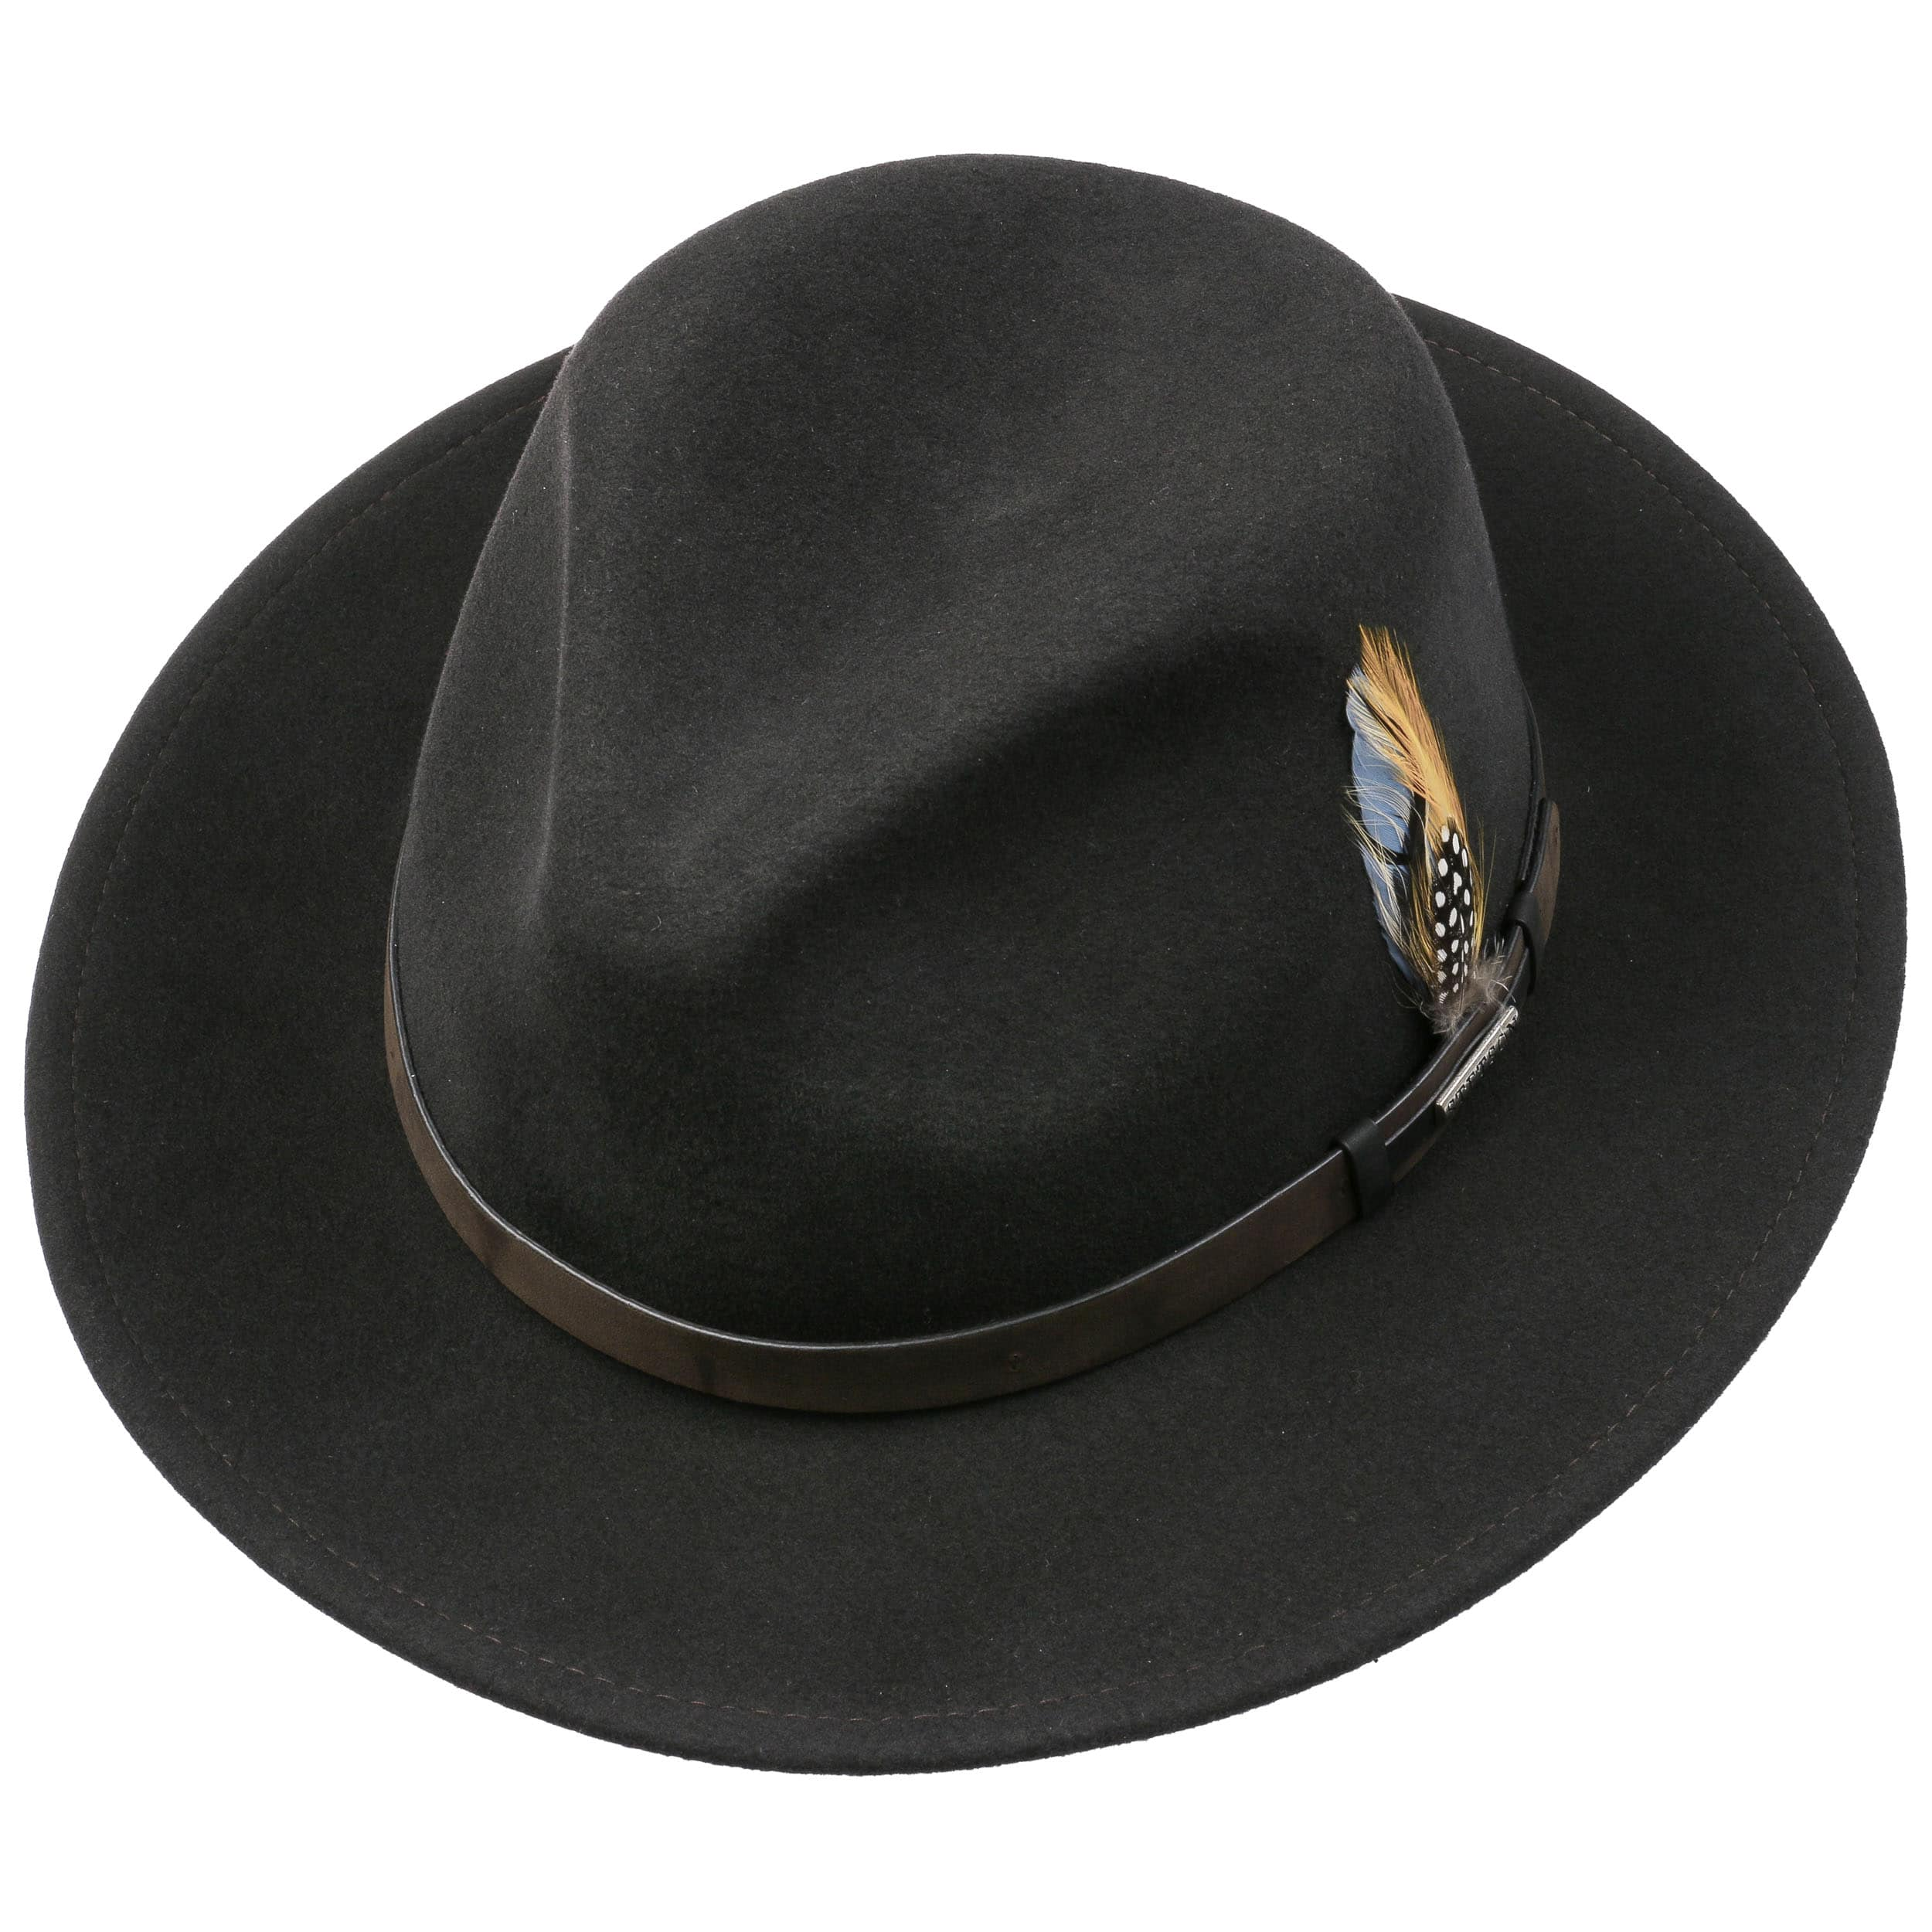 ... Sombrero VitaFelt Sardis by Stetson - marrón oscuro 1 ... 6ea4fffb65b7